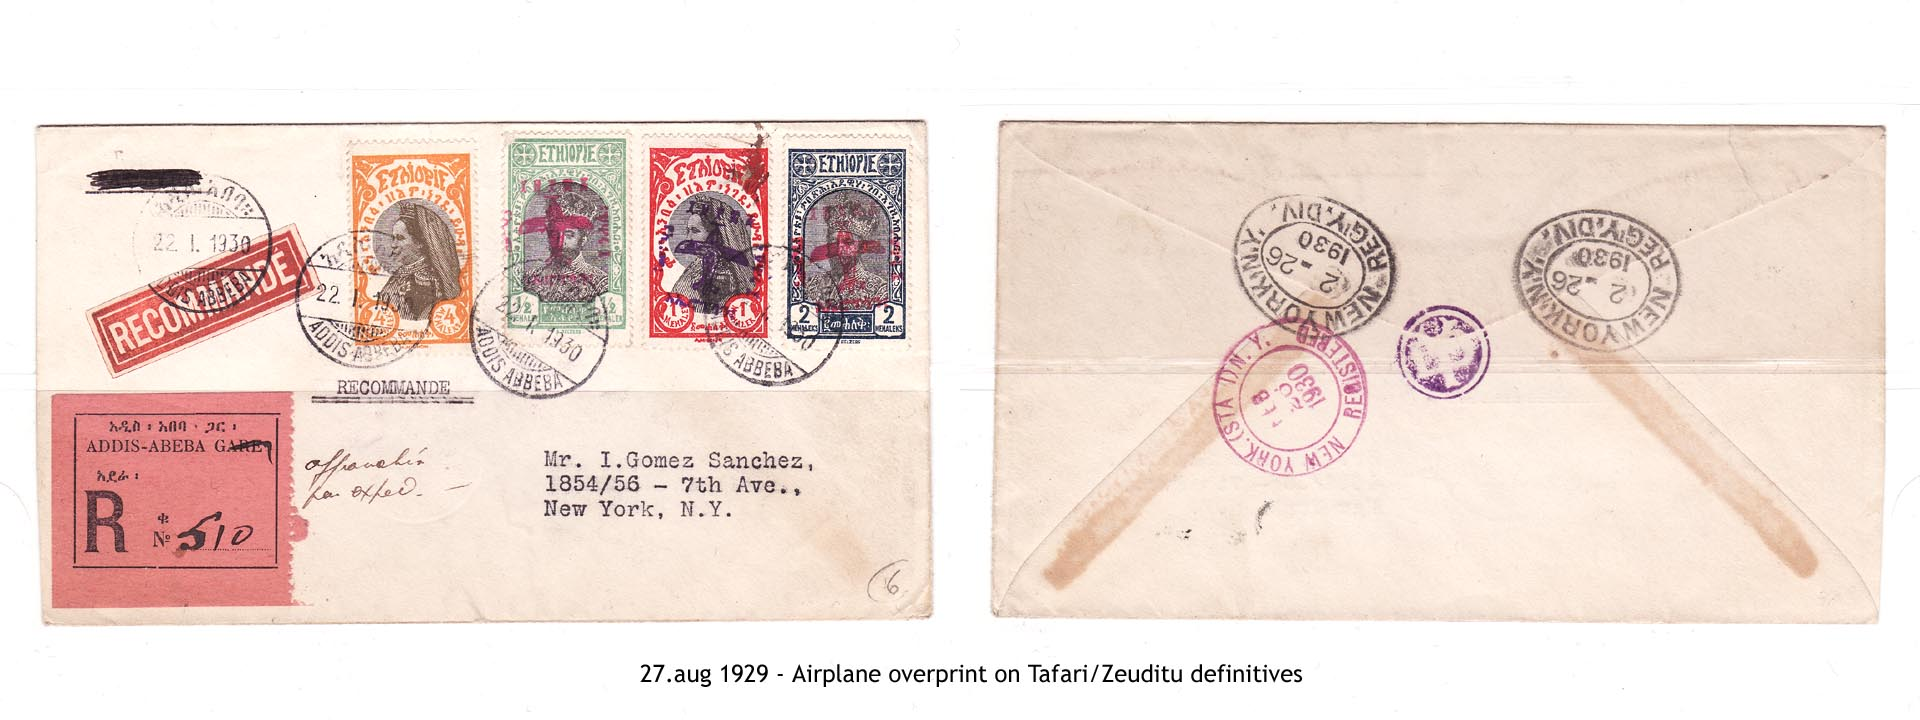 19290827 - Airplane overprint on Tafari-Zeuditu definitives